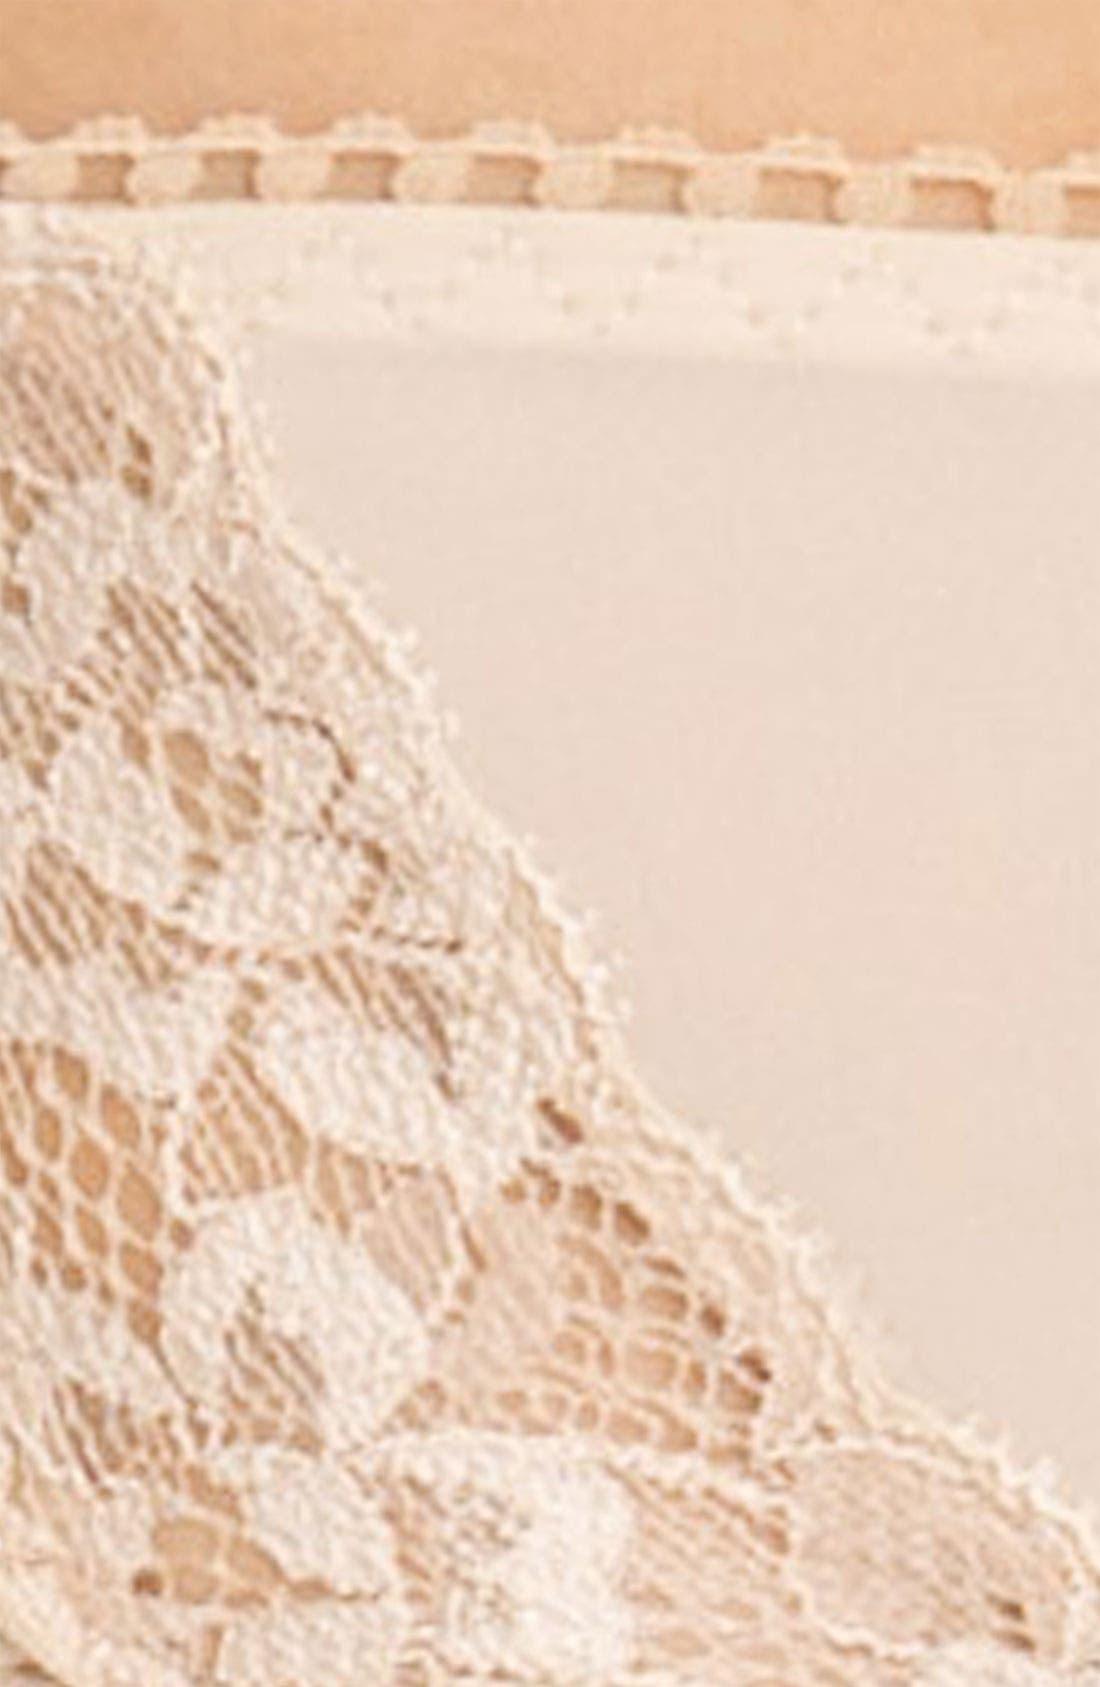 'Bodysuede' Lace Trim High Cut Briefs,                             Alternate thumbnail 3, color,                             NATURAL NUDE